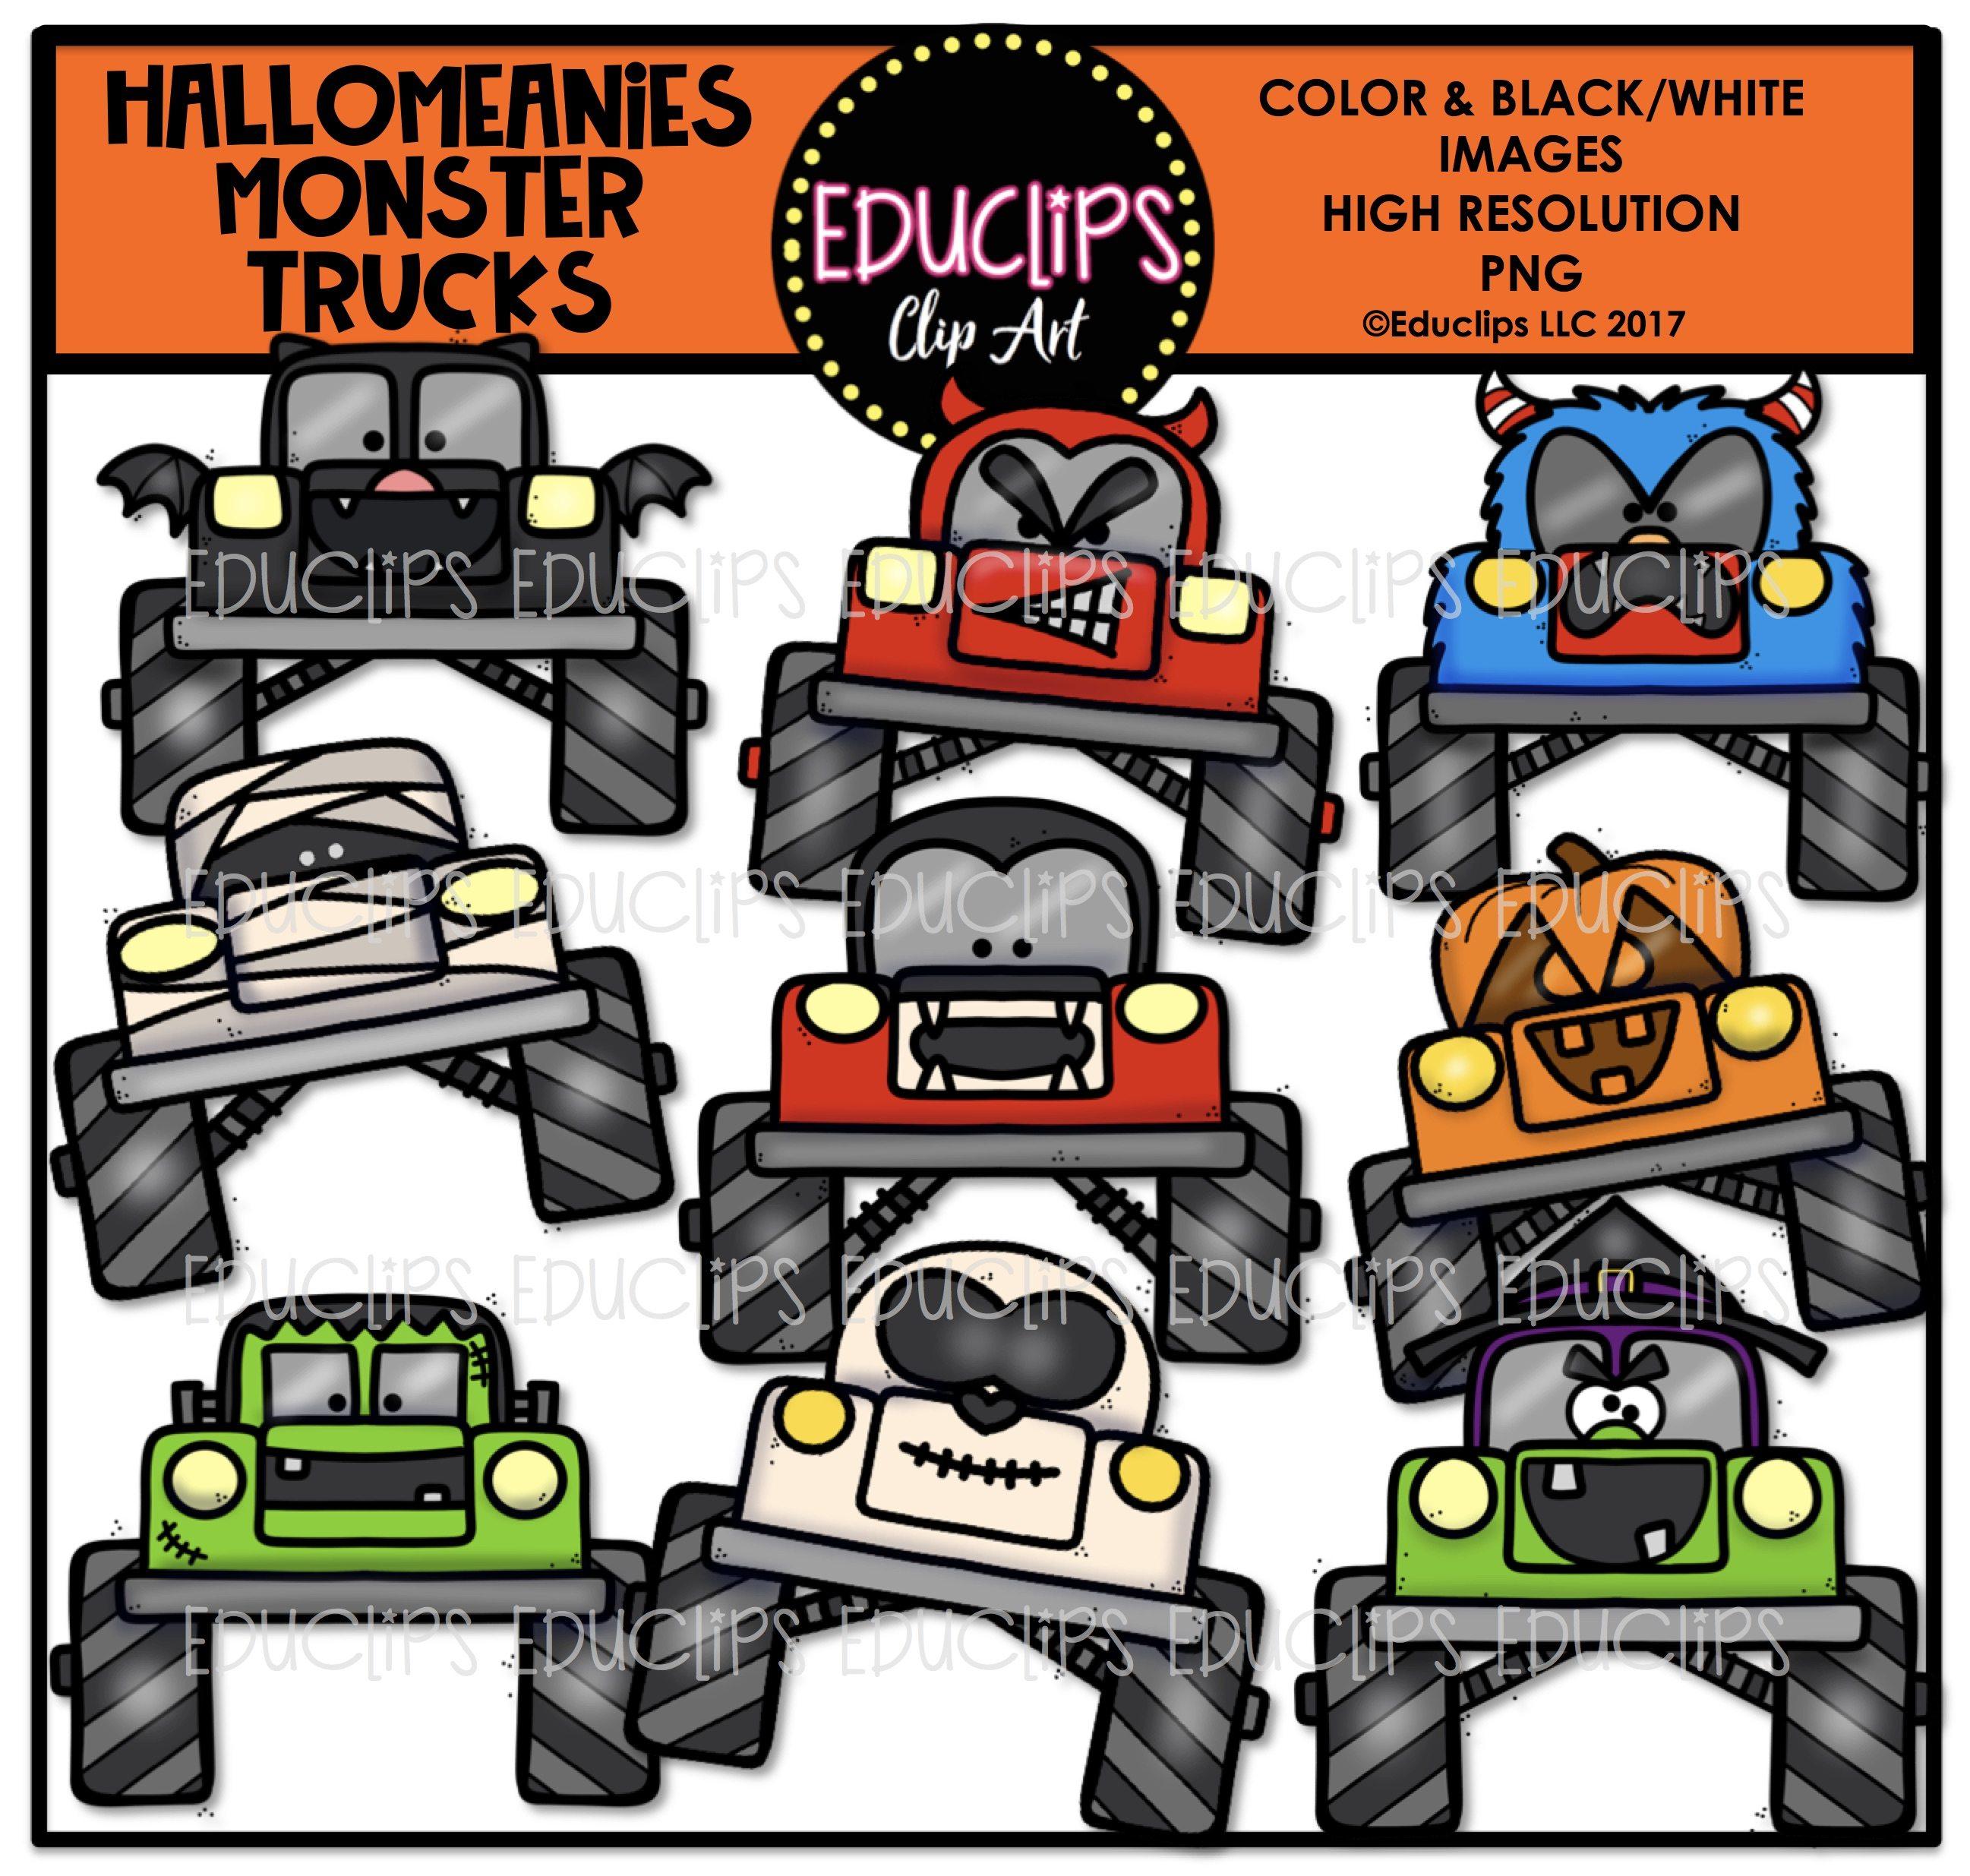 Hallomeanies Monster Trucks Clip Art Bundle Color And B W Edu Clips